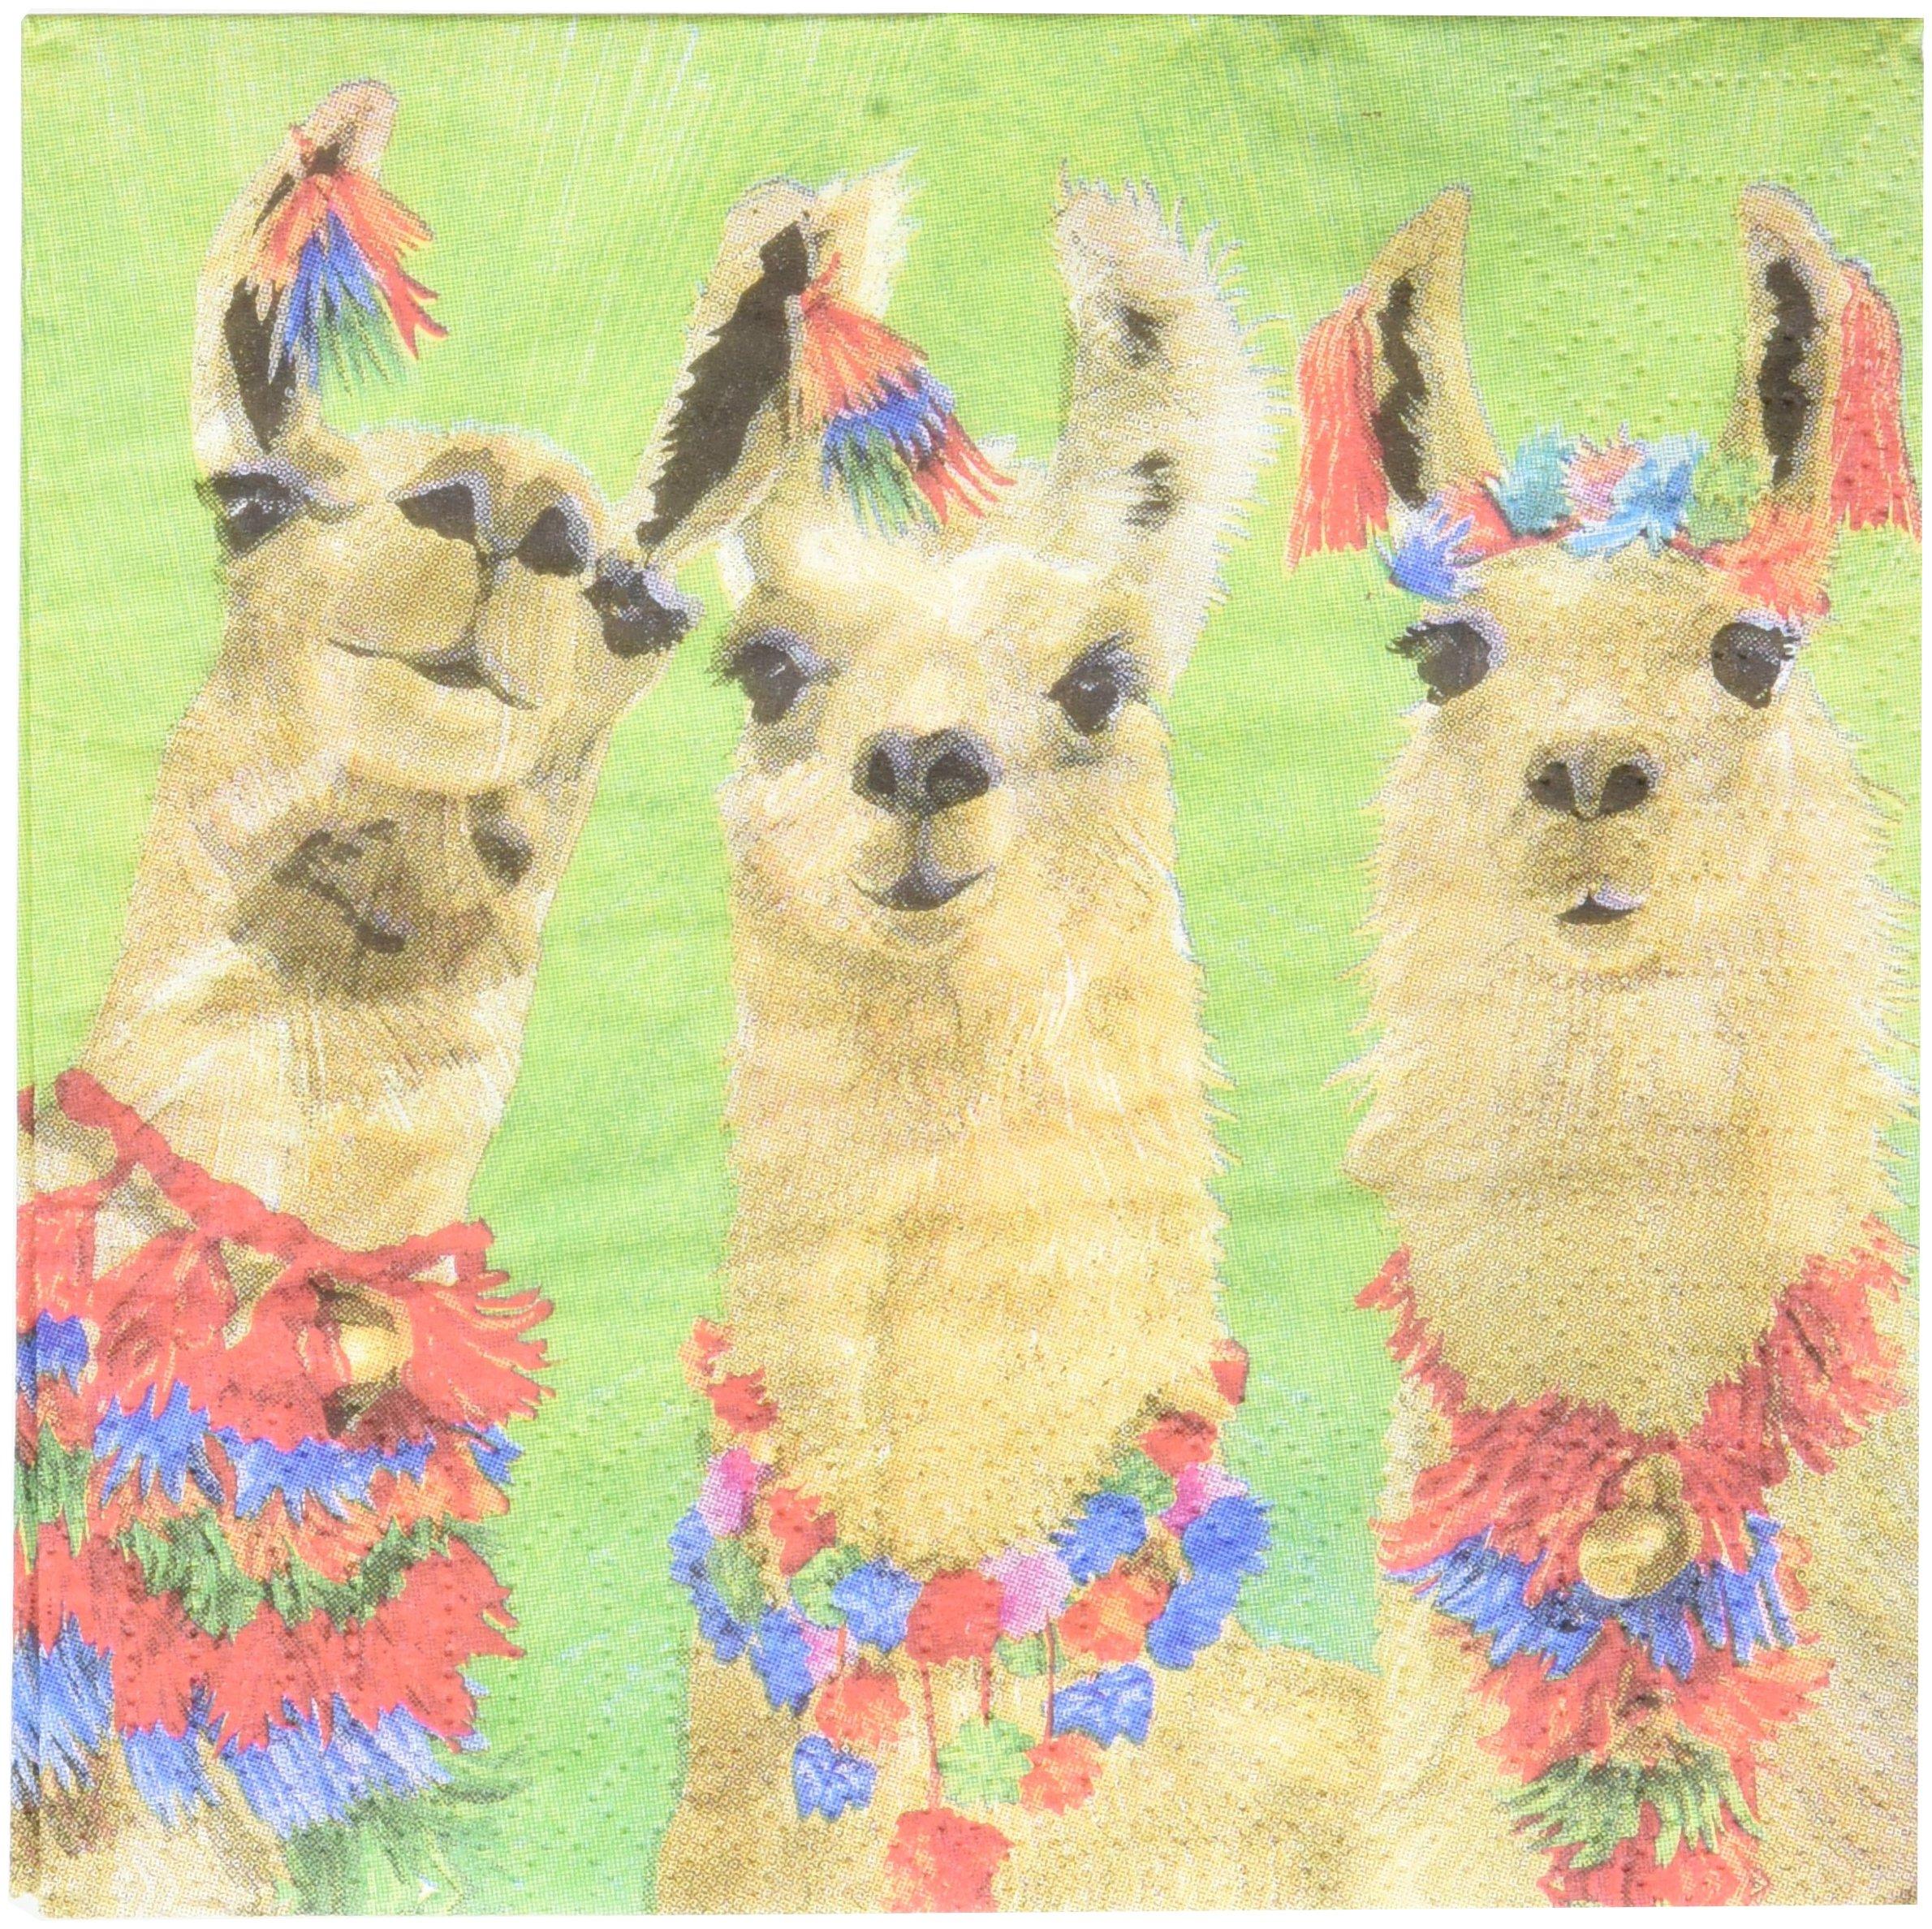 Paperproducts Design PPD 1252790 Llama Amigos Beverage/Cocktail Paper Napkins,5''x5'', Multicolor